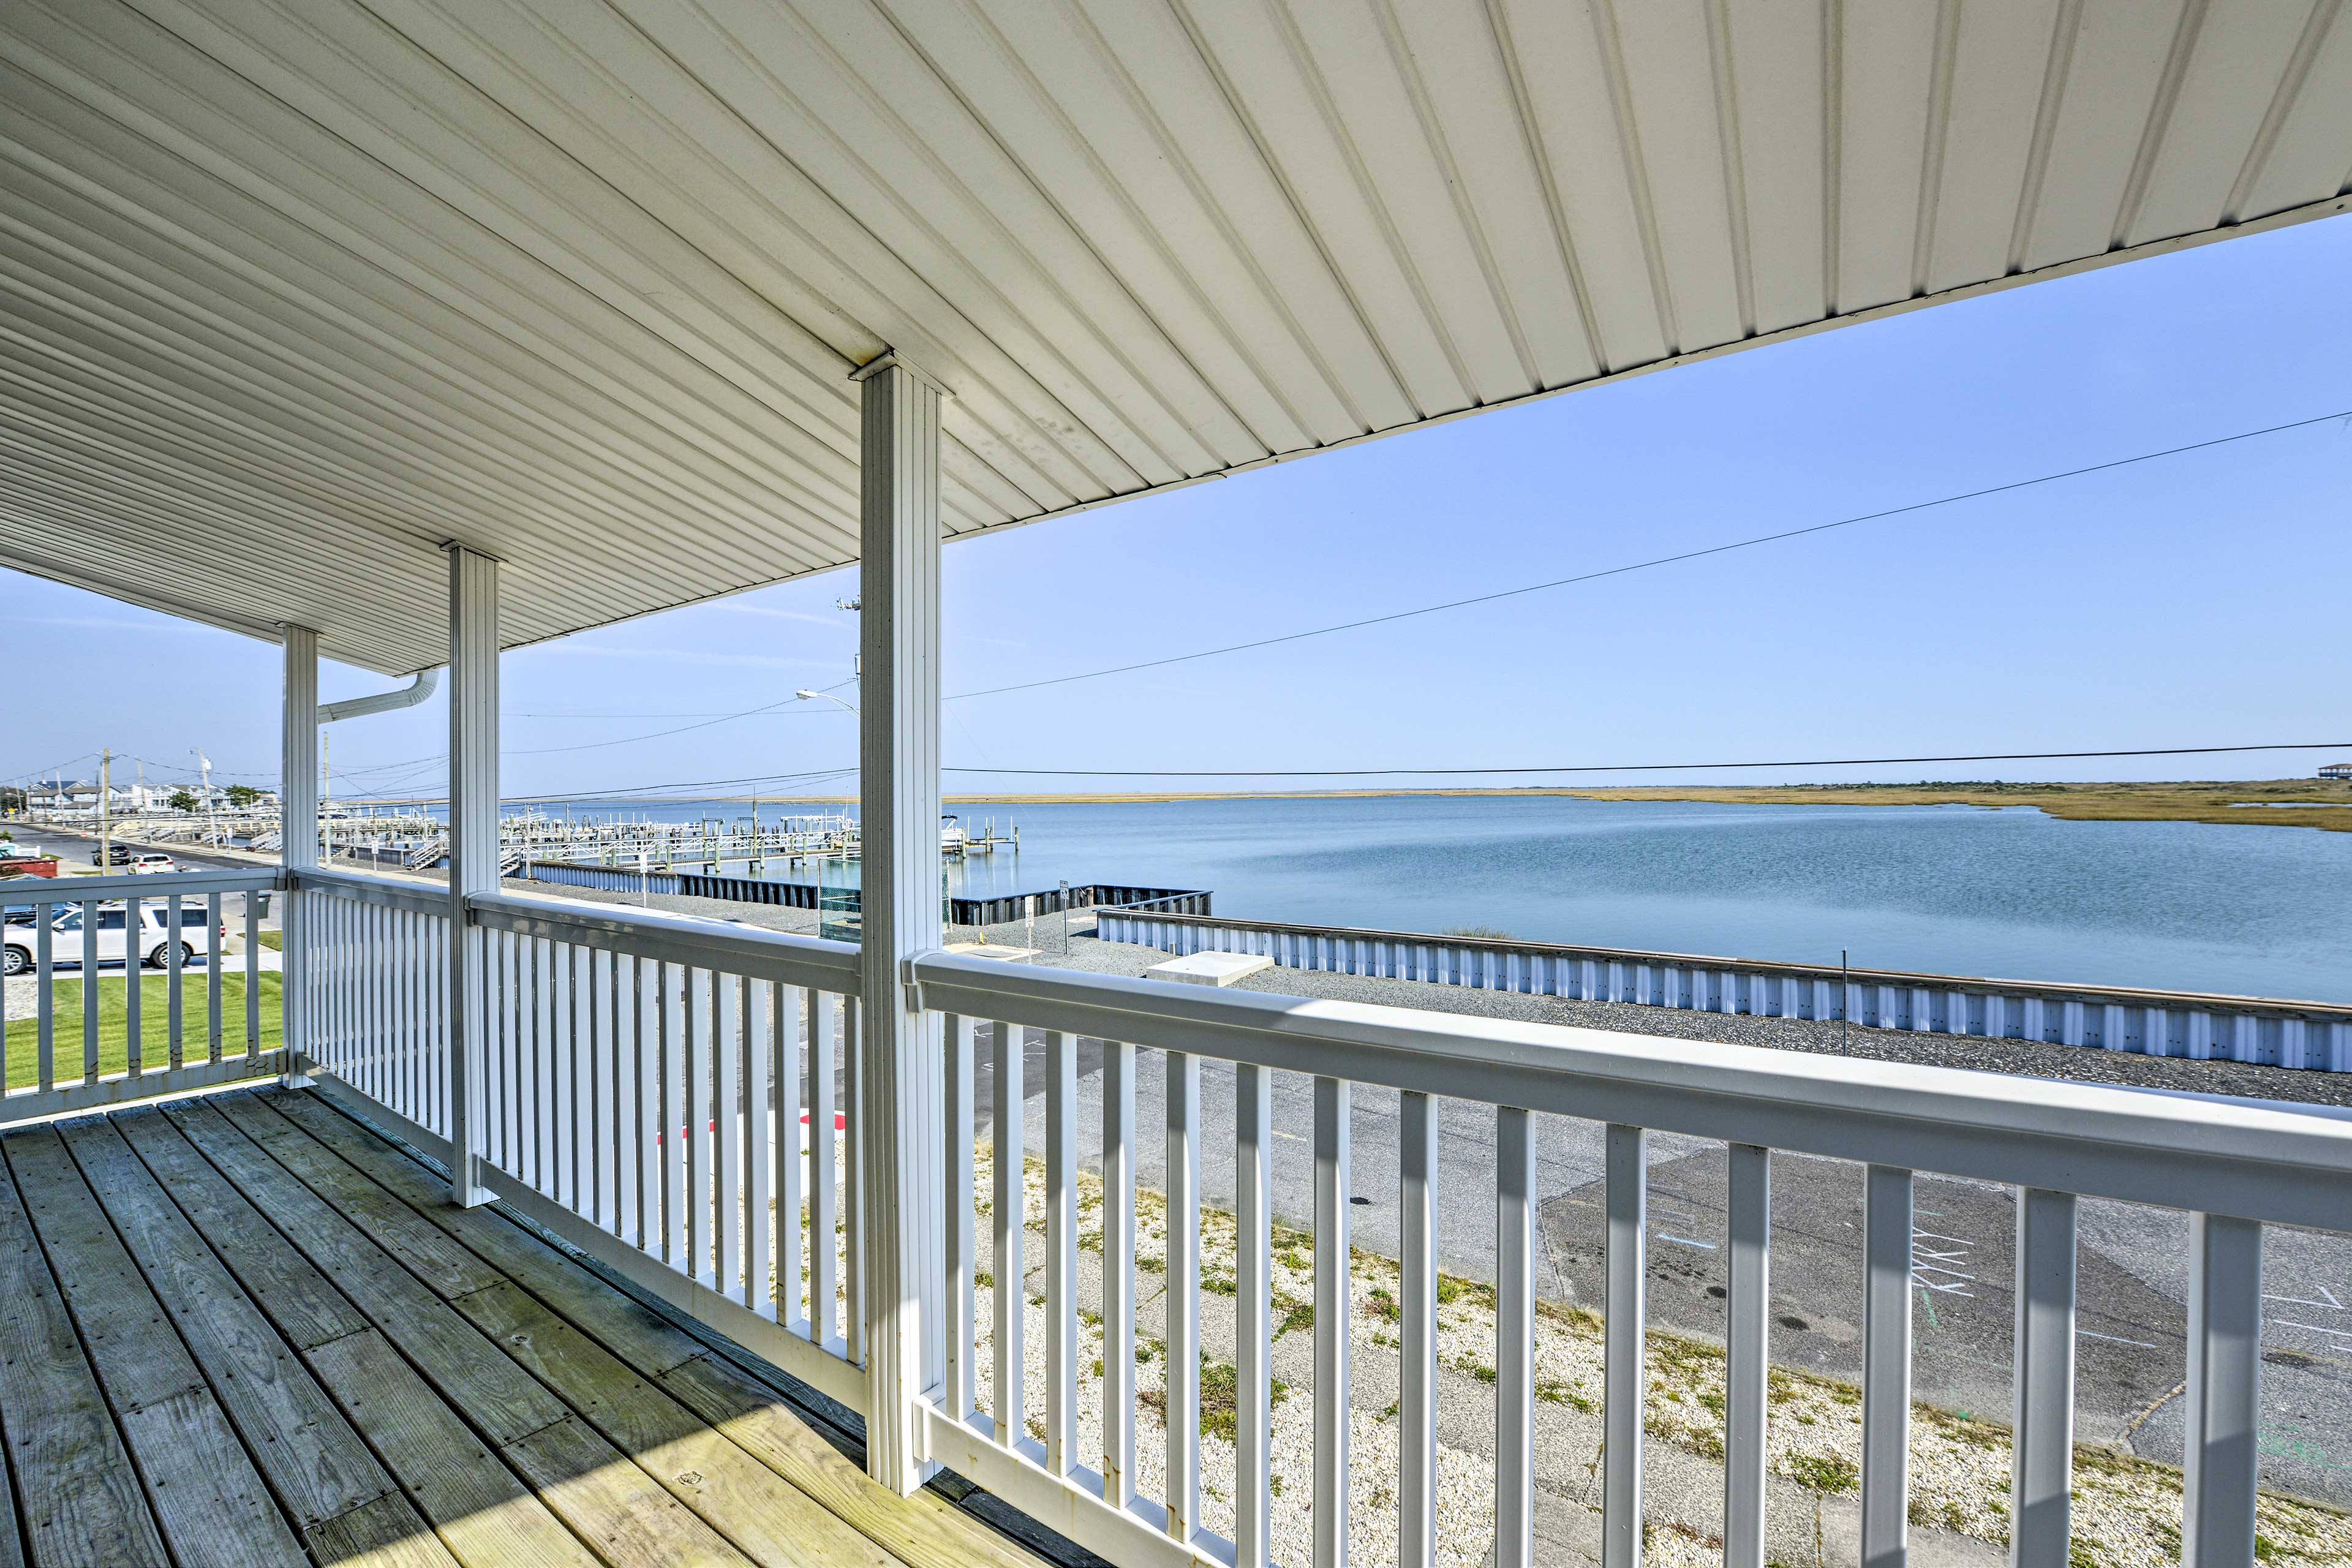 Enjoy a beach vacation to Brigantine, New Jersey!